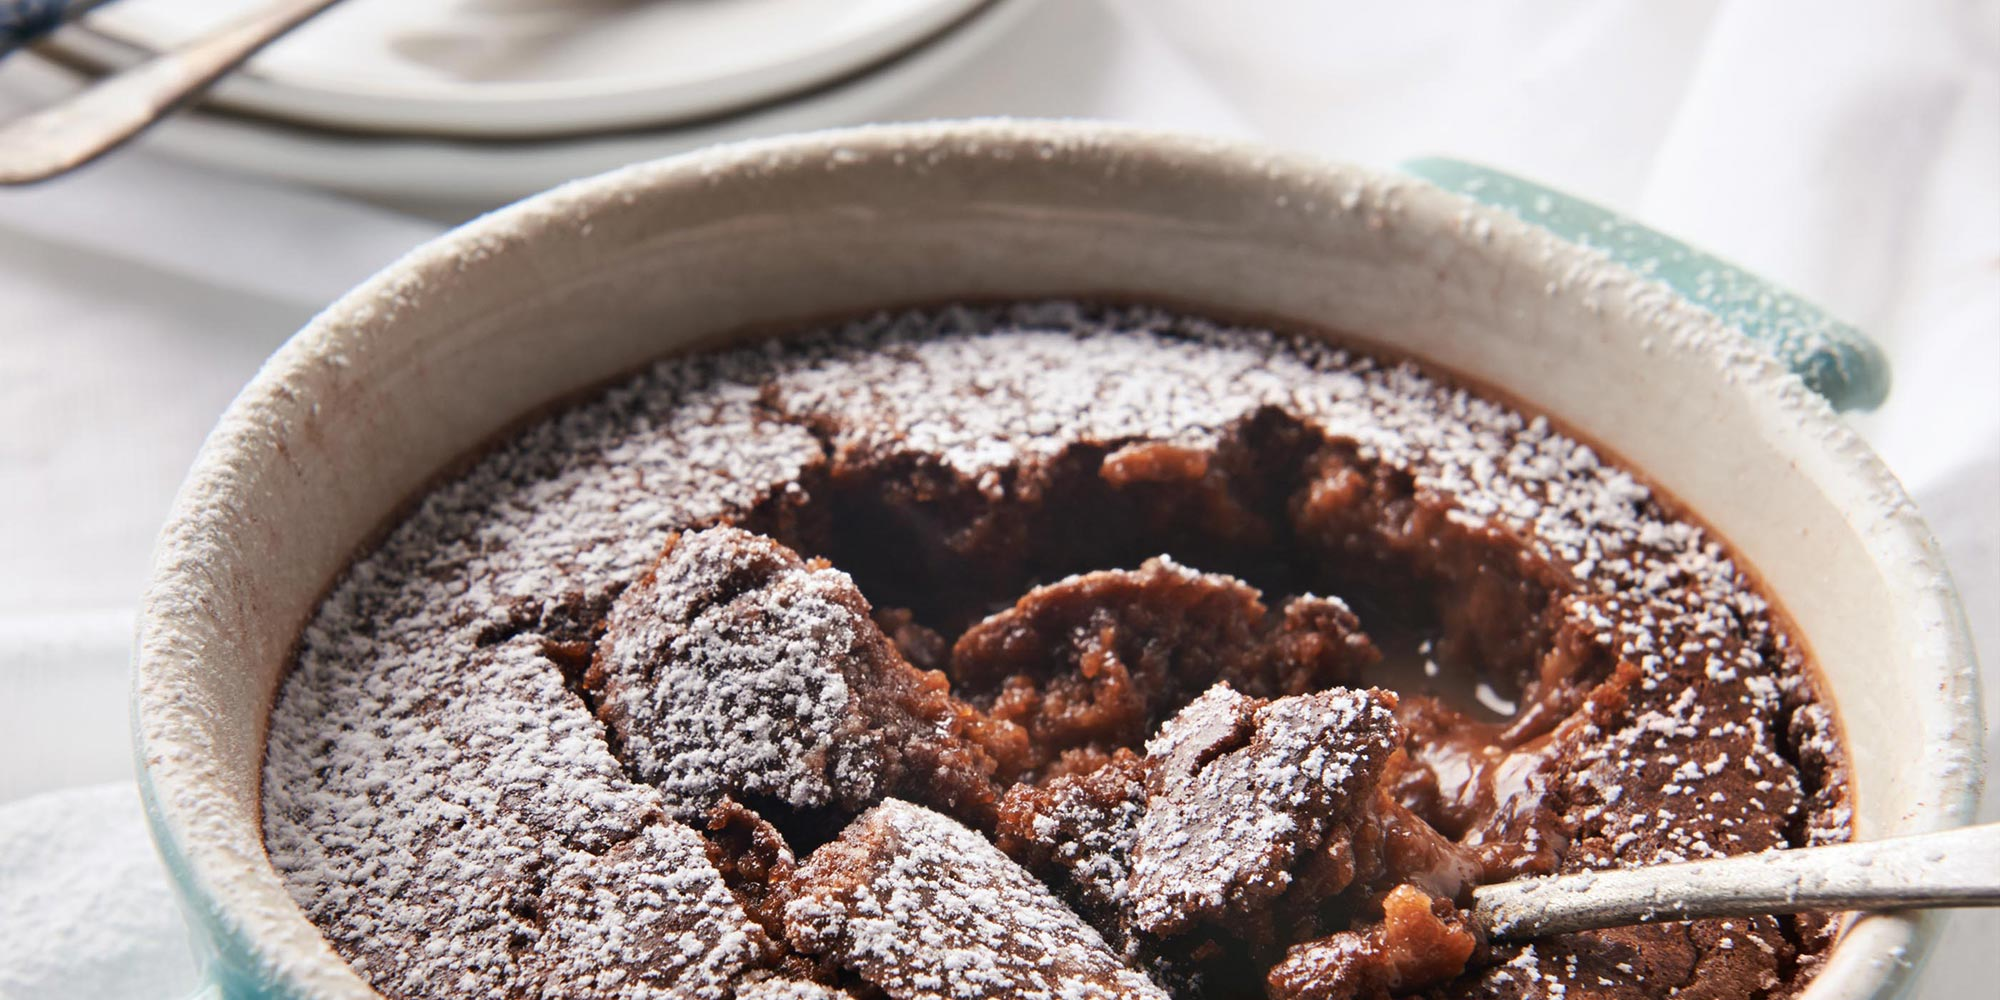 Chocolate Pudding Cake Recipe No Calorie Sweetener Sugar Substitute Splenda Sweeteners